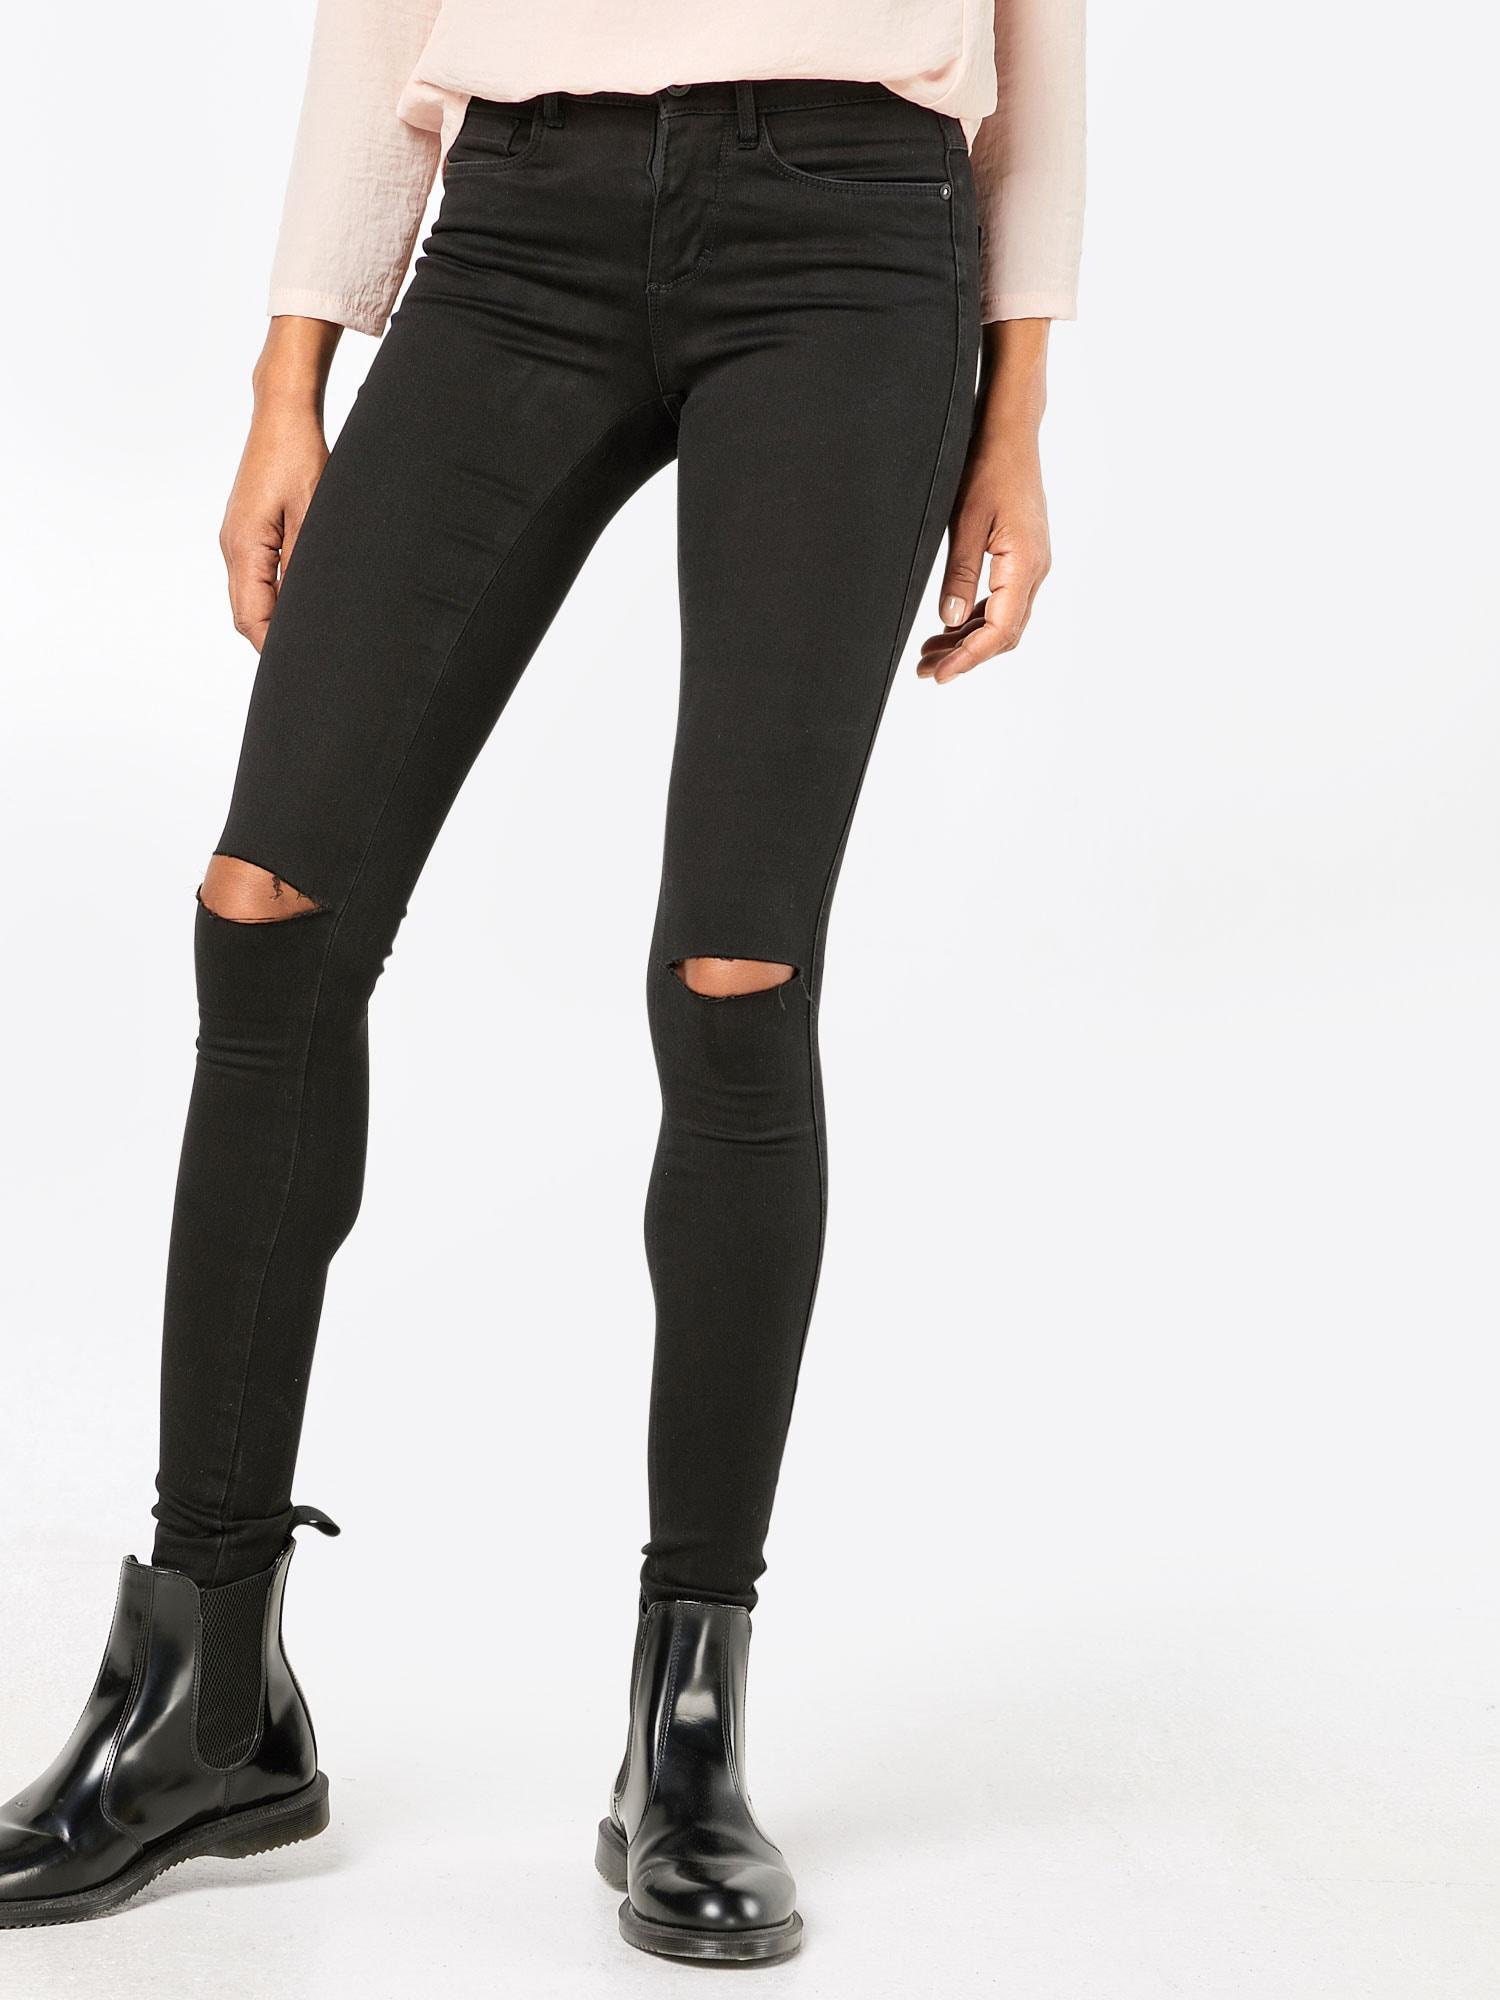 ONLY, Dames Jeans, zwart